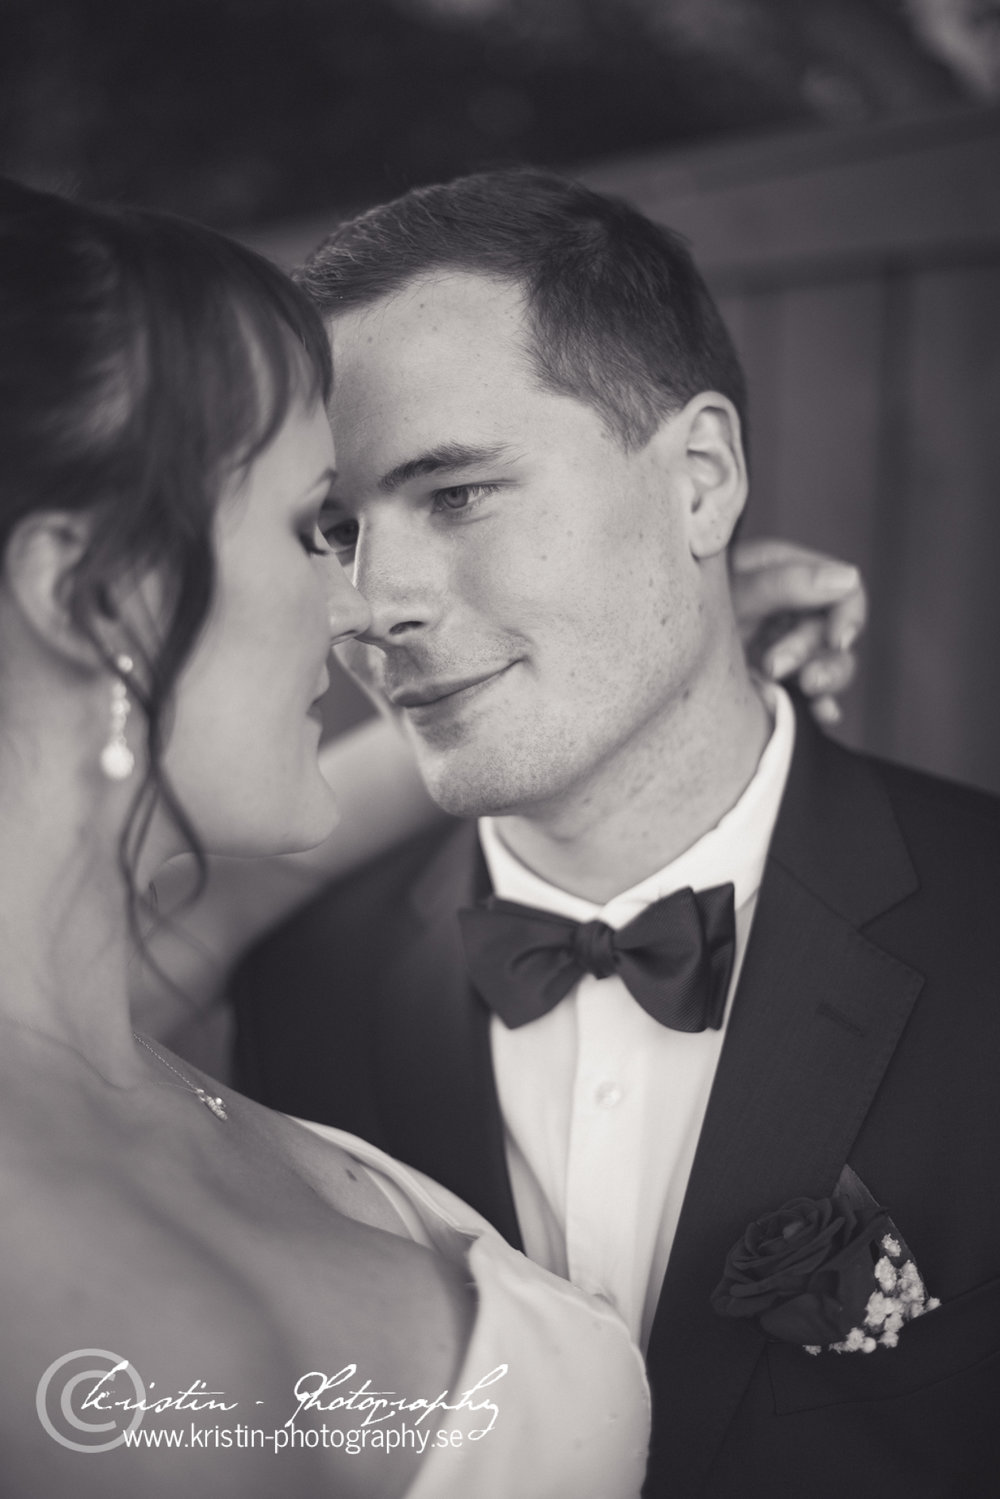 Bröllopsfotograf i Stockholm, Kristin - Photography , Munchen Bryggeriet-222.jpg